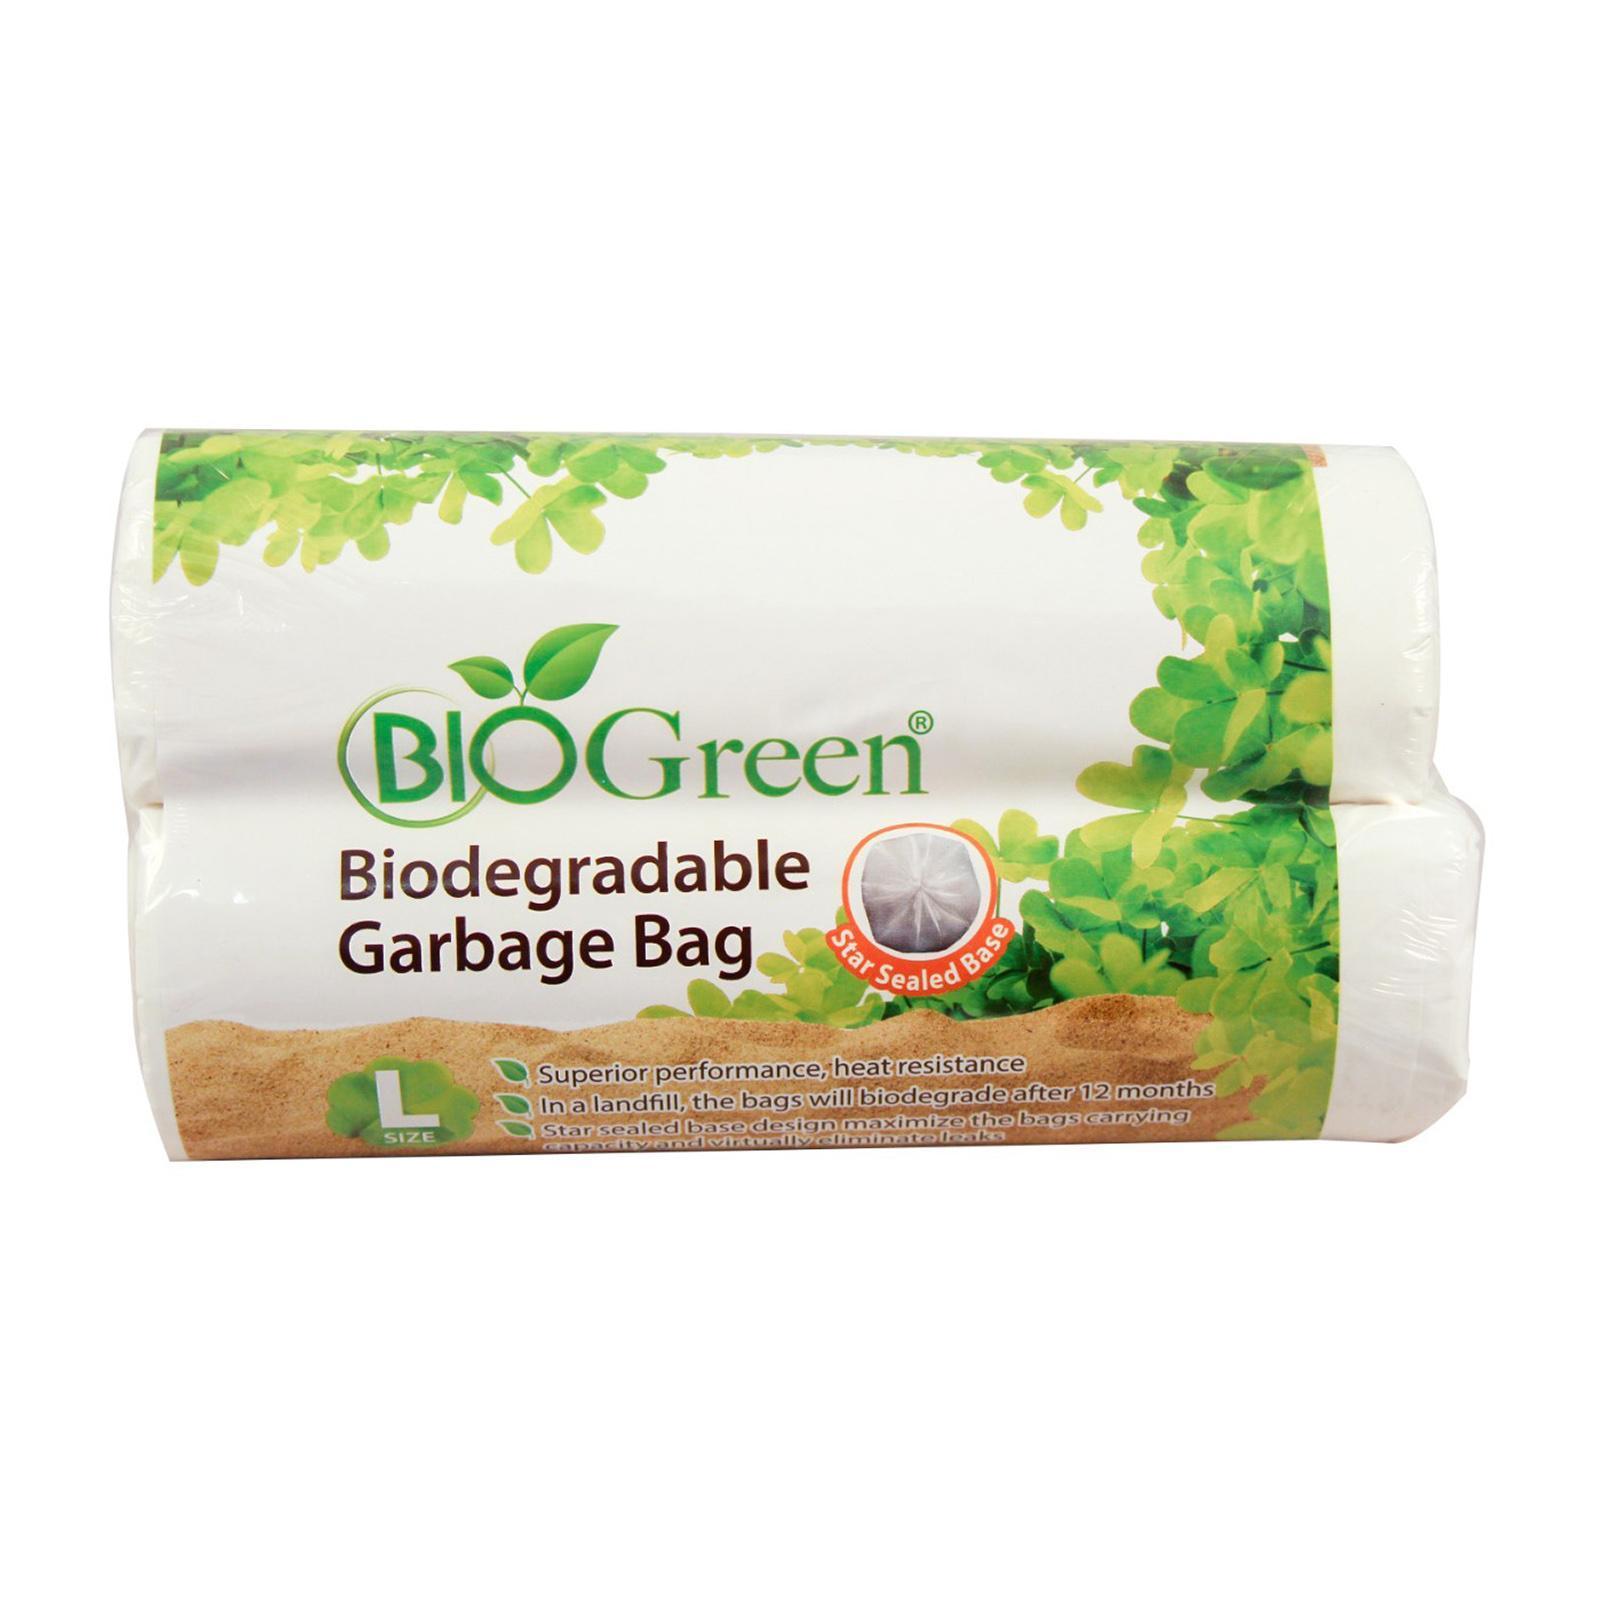 BioGreen Biodegradable Garbage Bag (L) - (L100 x W780)MM (BD-GB3039/2-10)